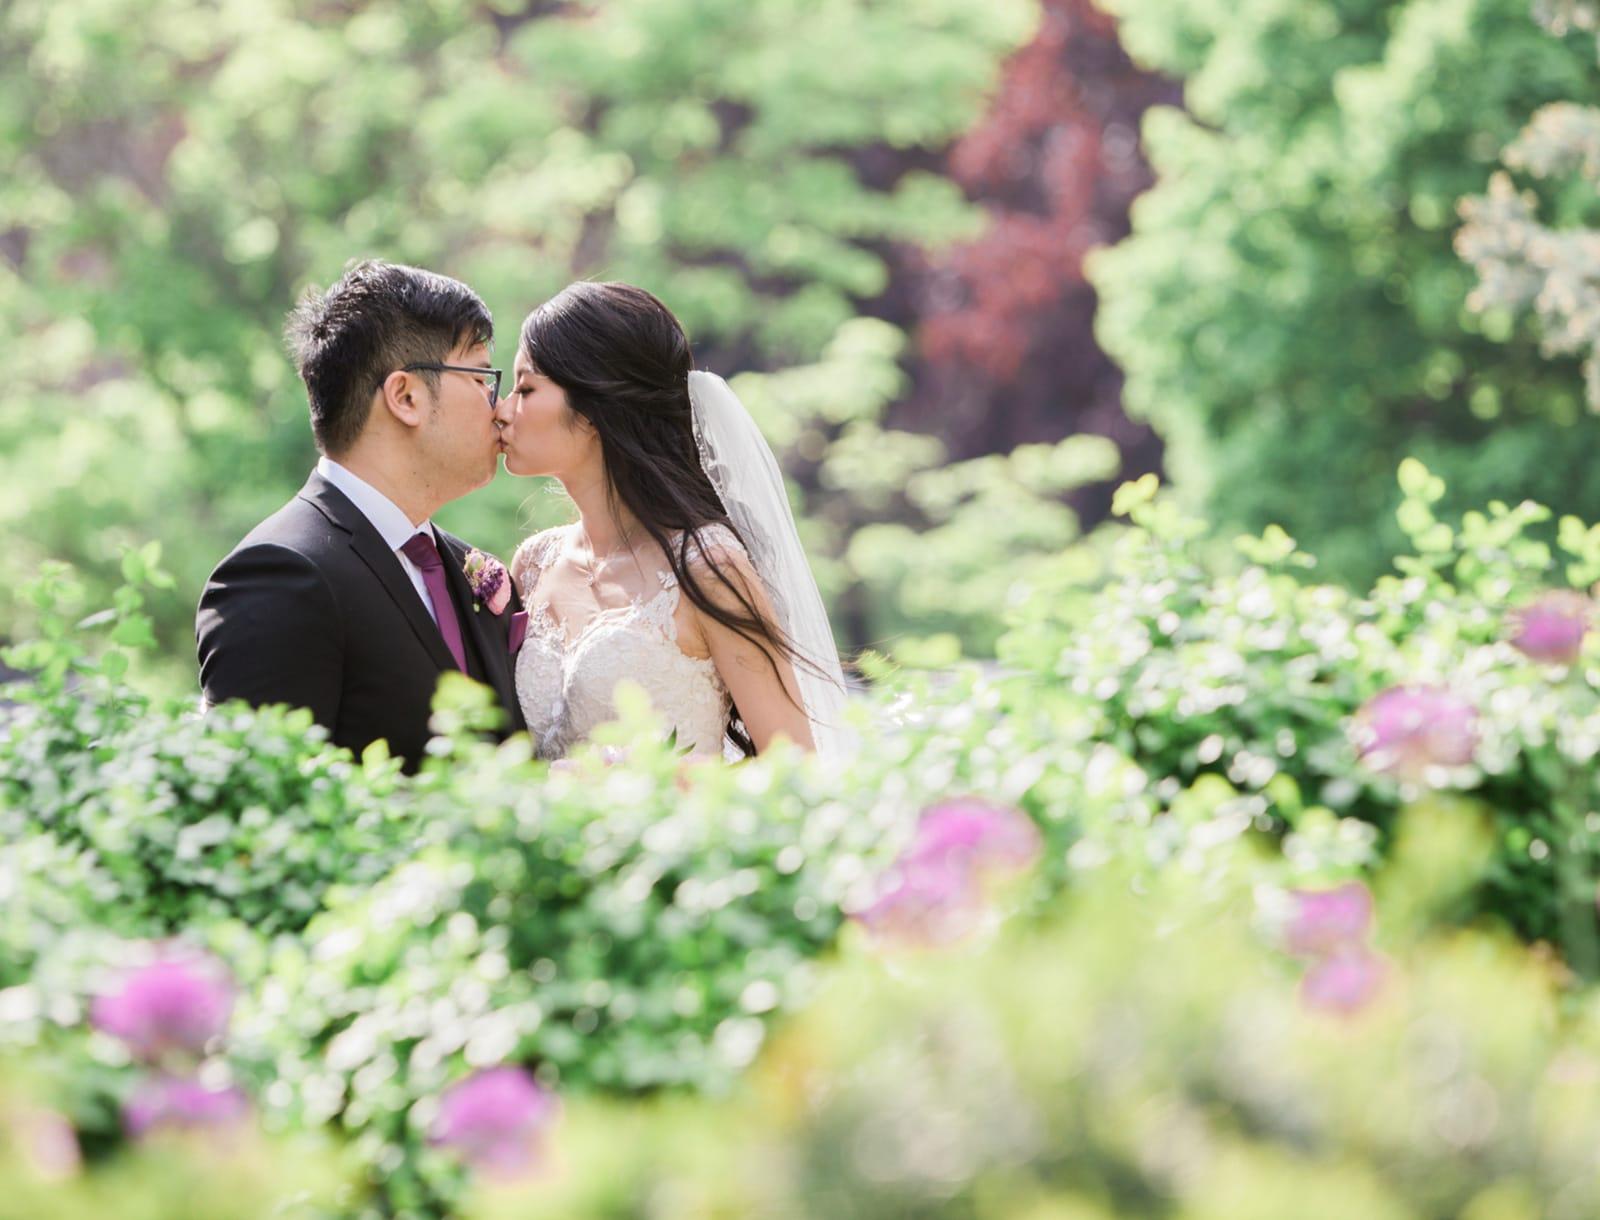 Toronto Bayview Golf Club Wedding Photos: Stephanie + Dickson